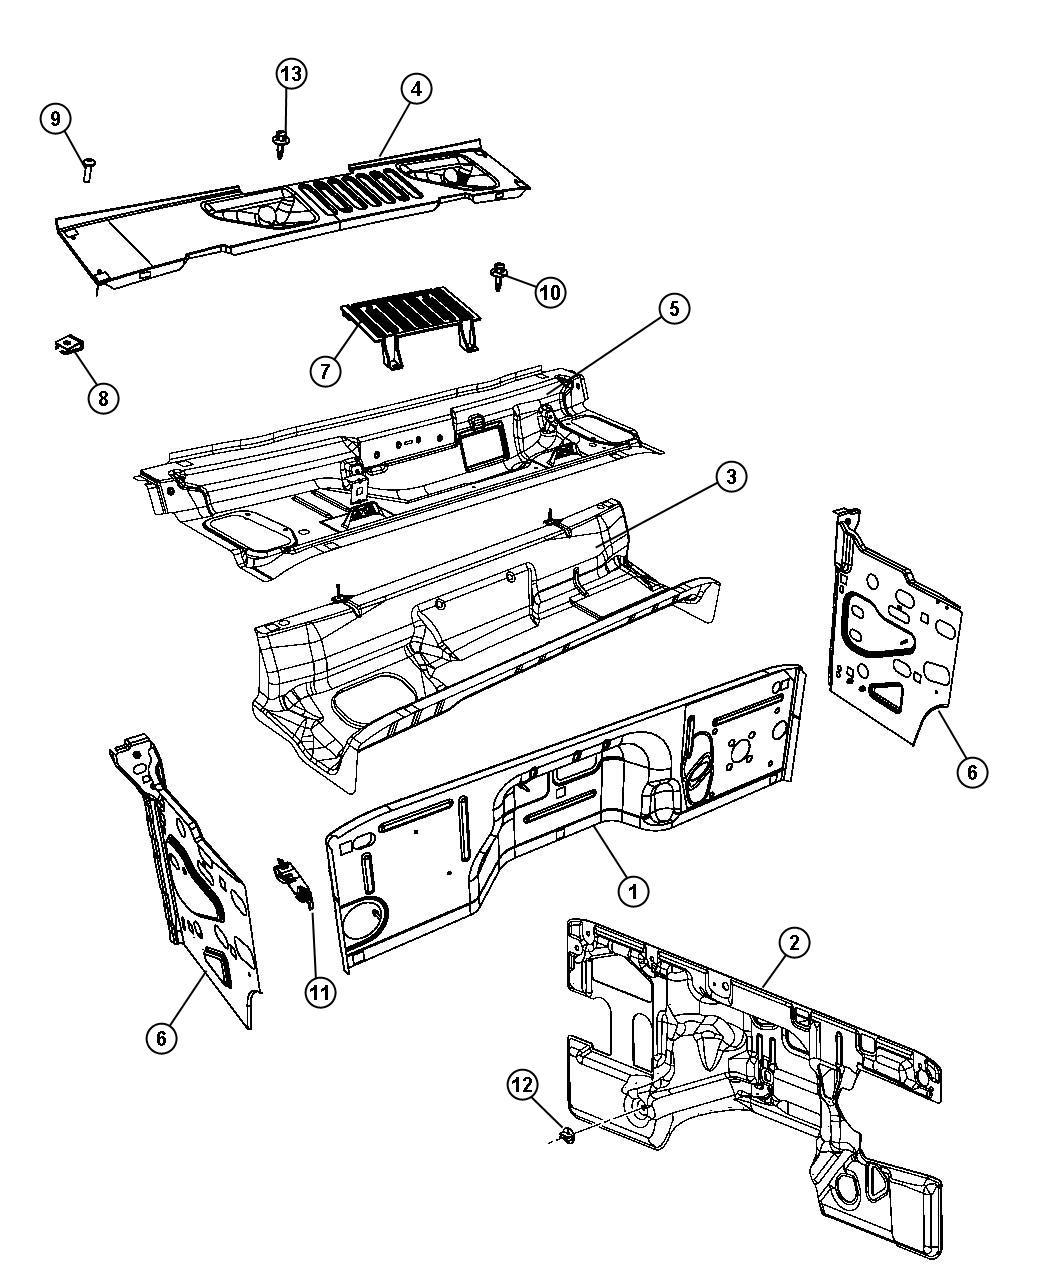 [DIAGRAM] Wiring Diagram 2008 Jeep Wrangler Rubicon FULL